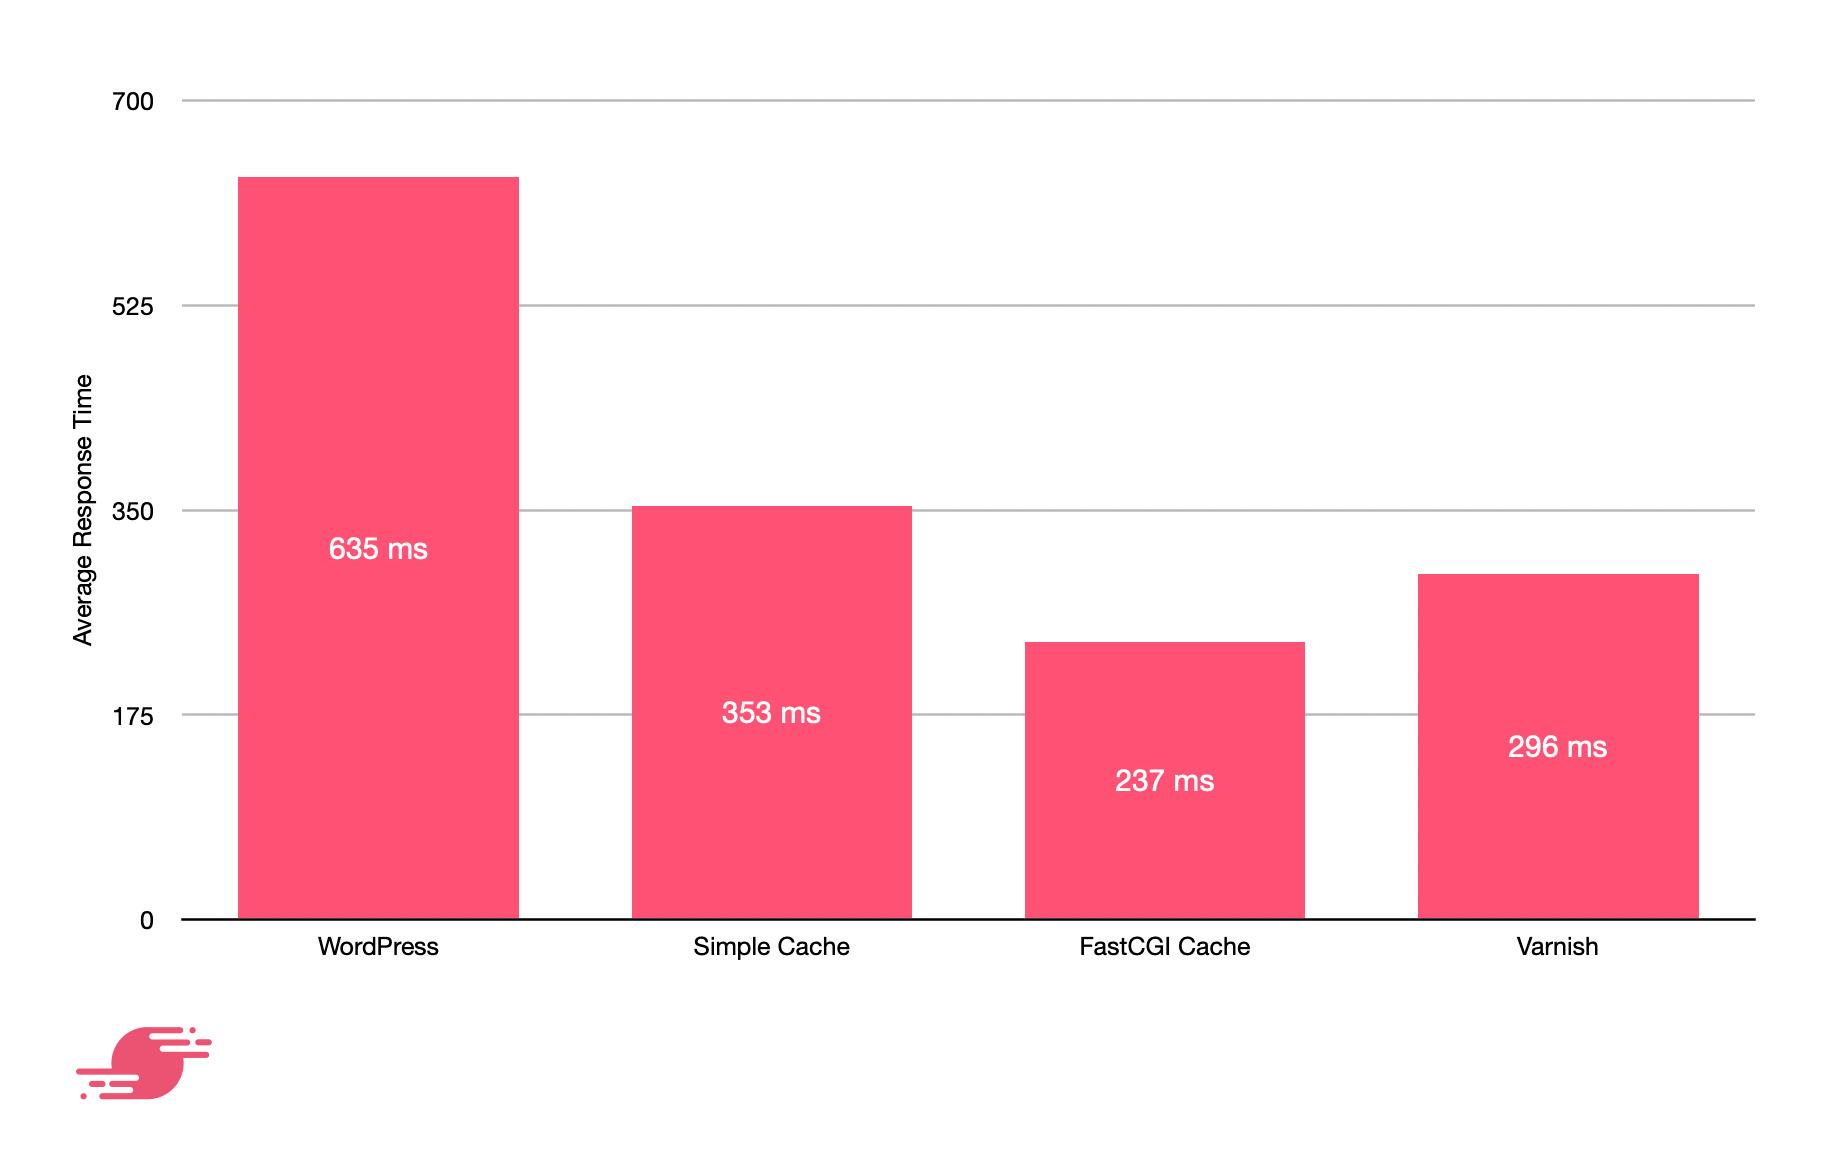 chart showing WordPress has the longest average response time